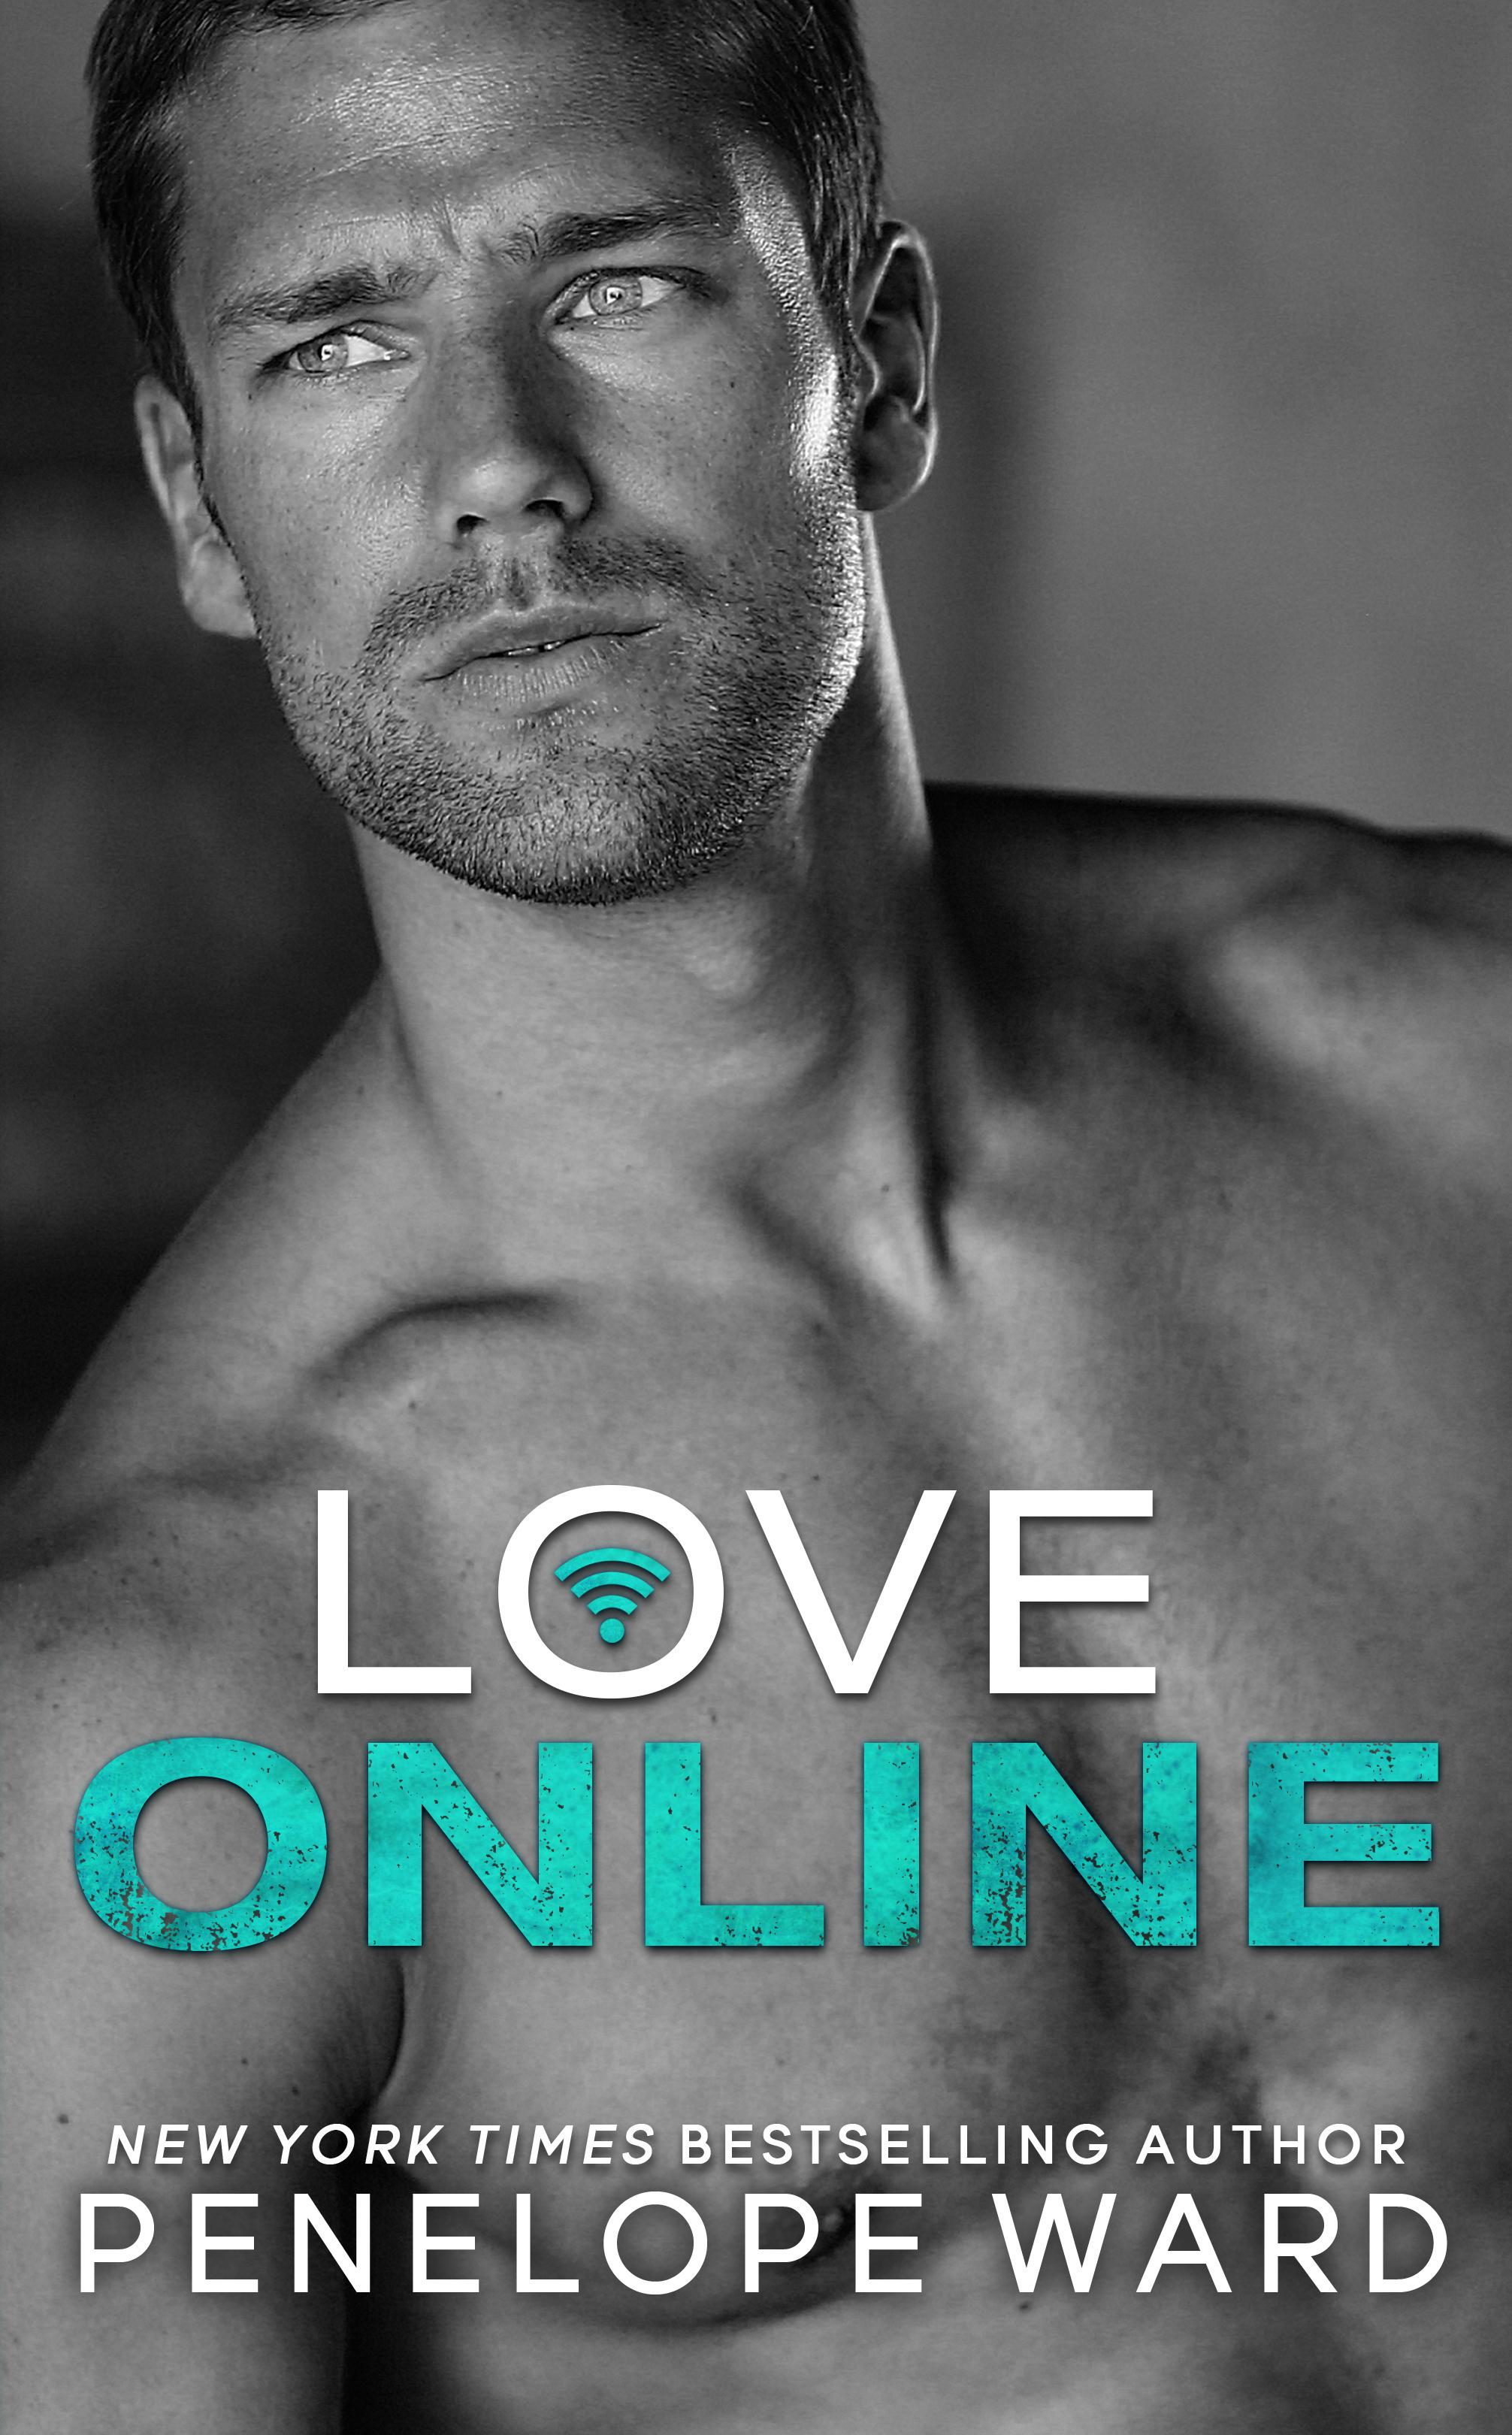 movie book of love online